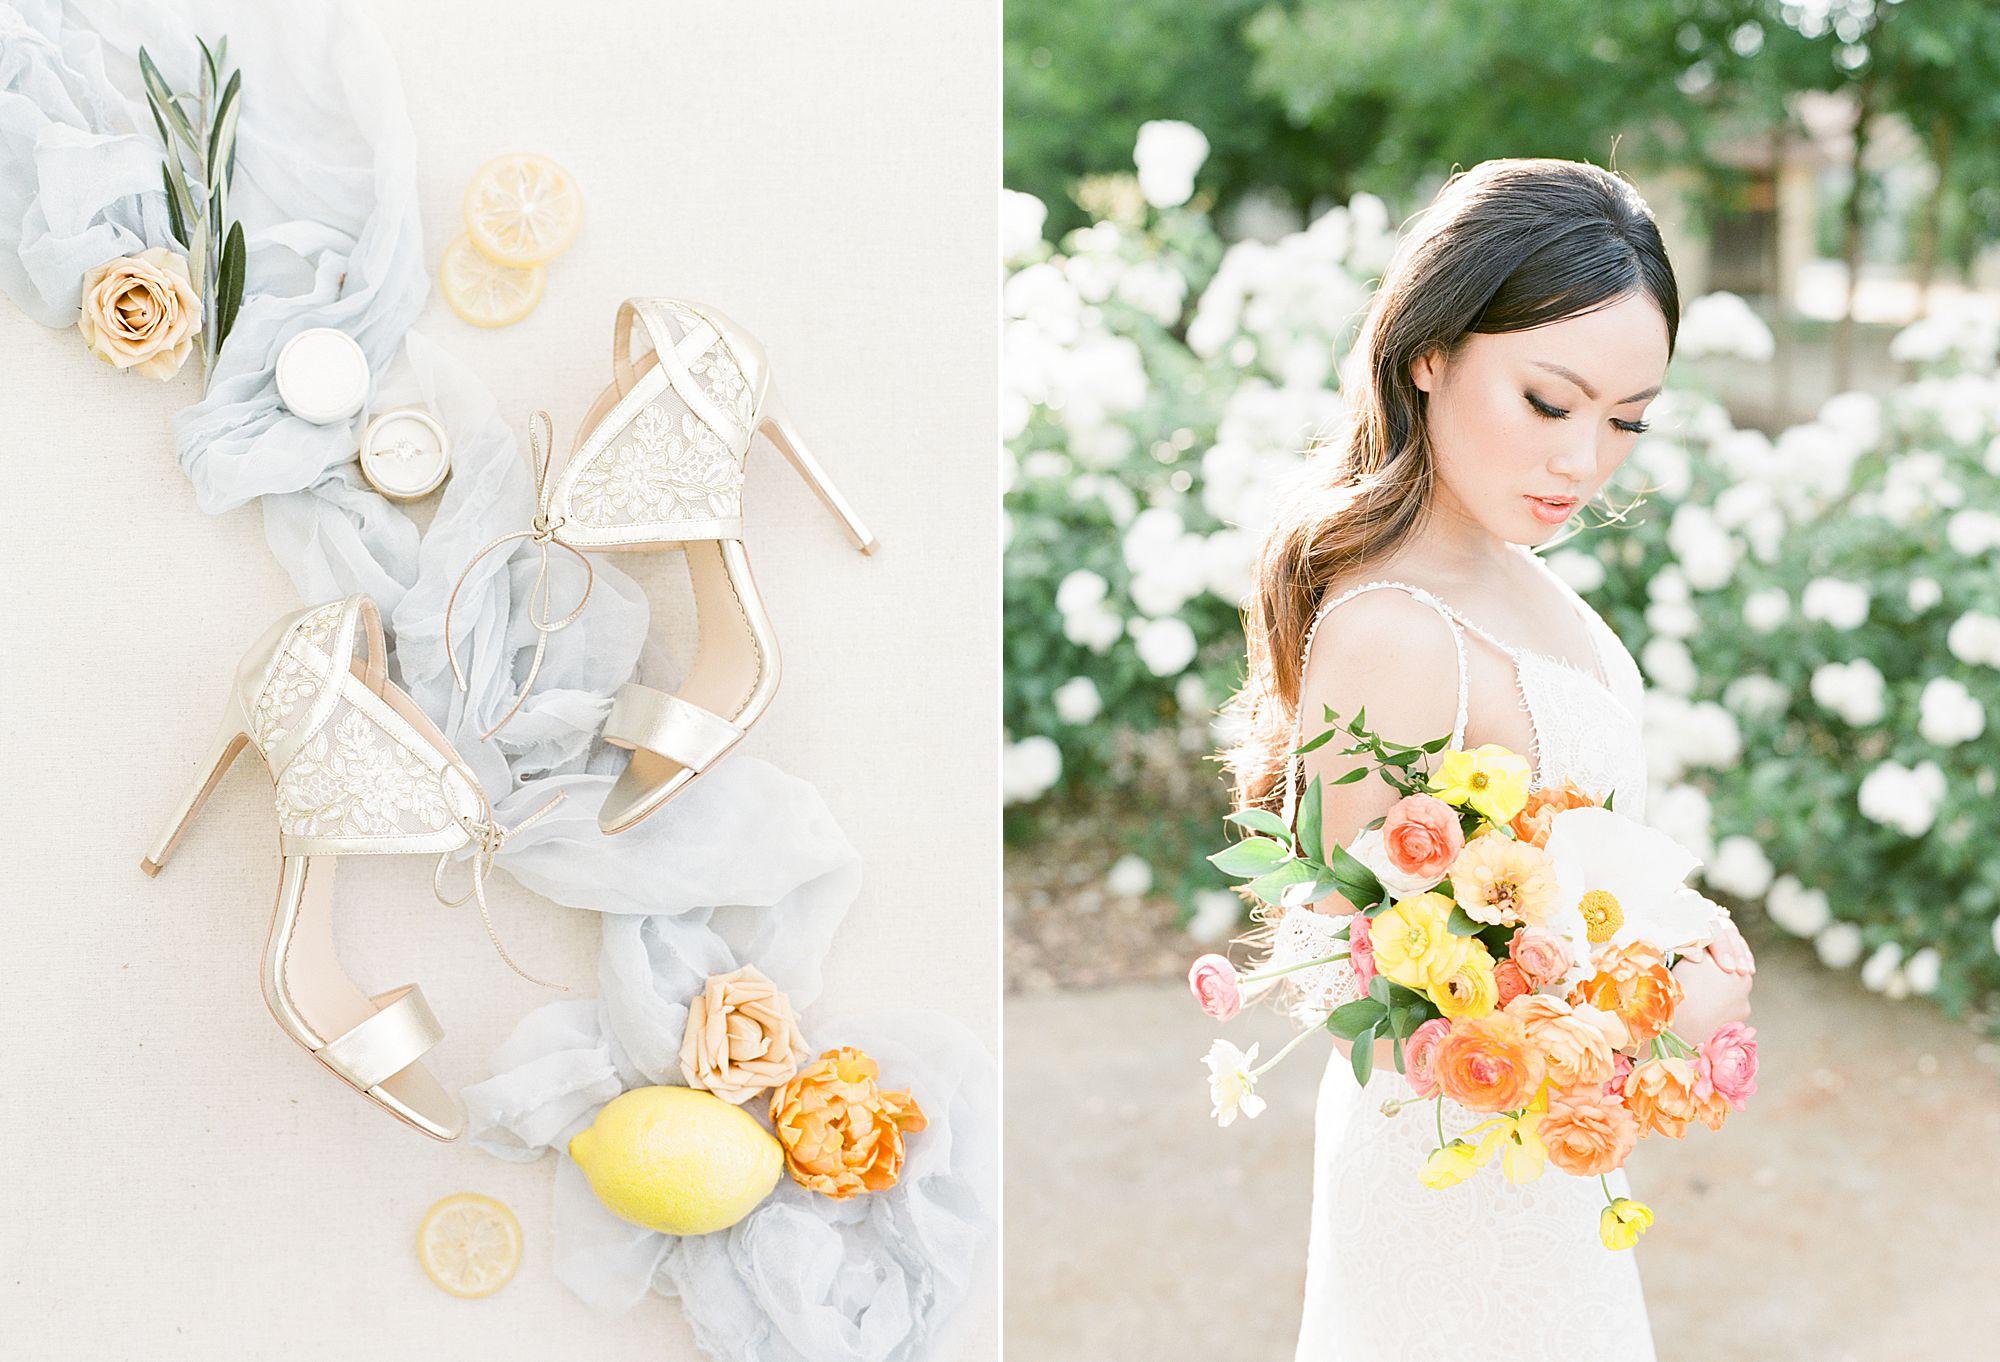 Italian Wedding Inspiration at The Maples Wedding & Event Center - Featured on Wedding Chicks - Ashley Baumgartner - Sacramento Wedding Phtoographer_0044.jpg